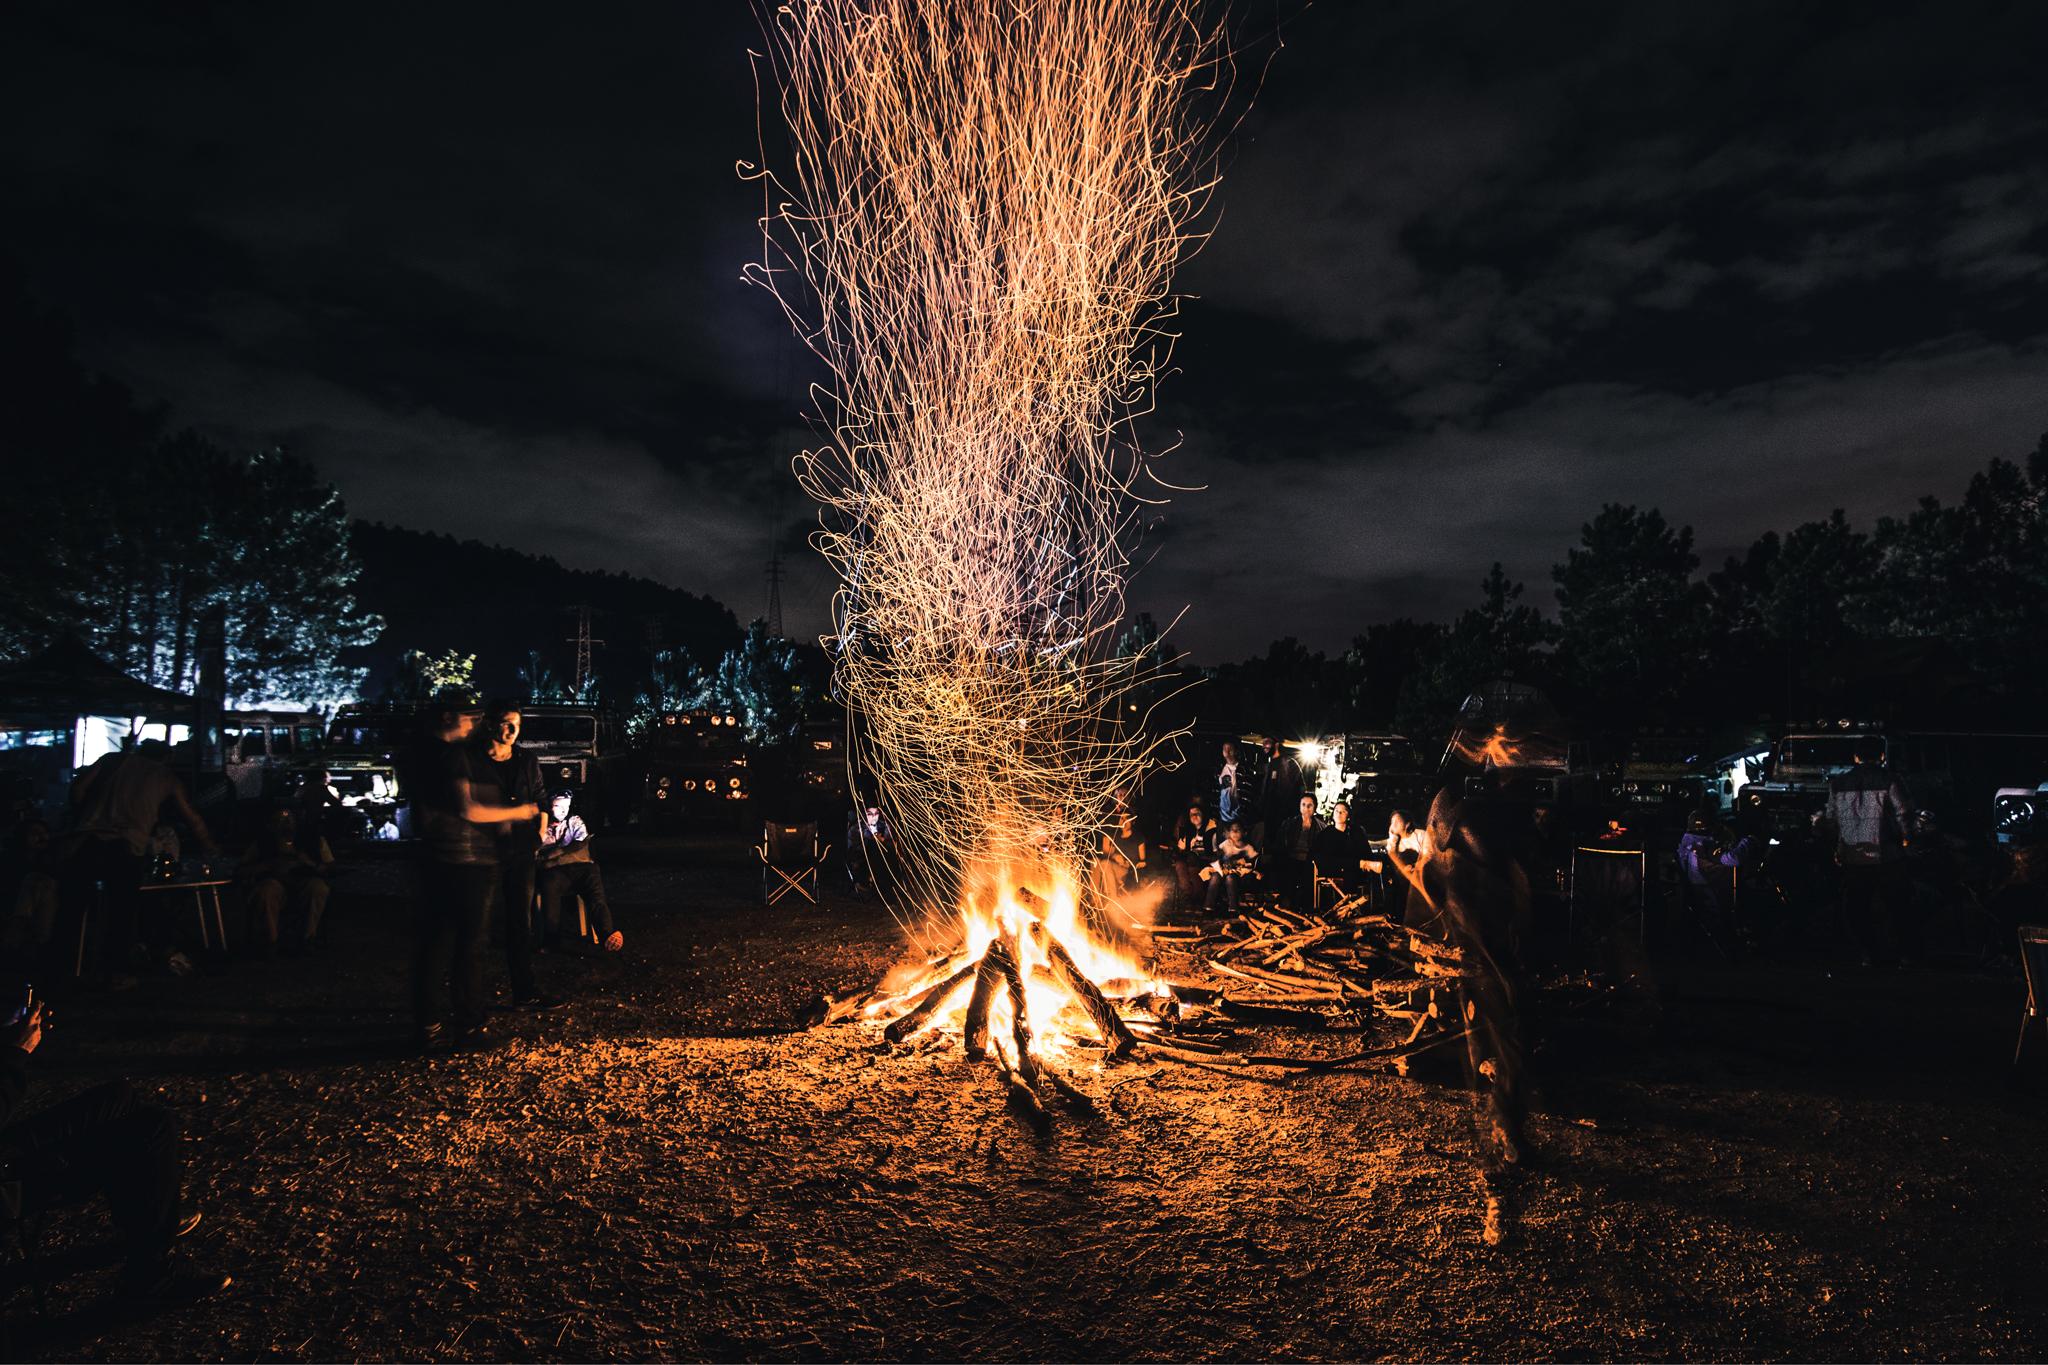 Bonfire-Night-Ilkley-Cricket-Club-2.jpg